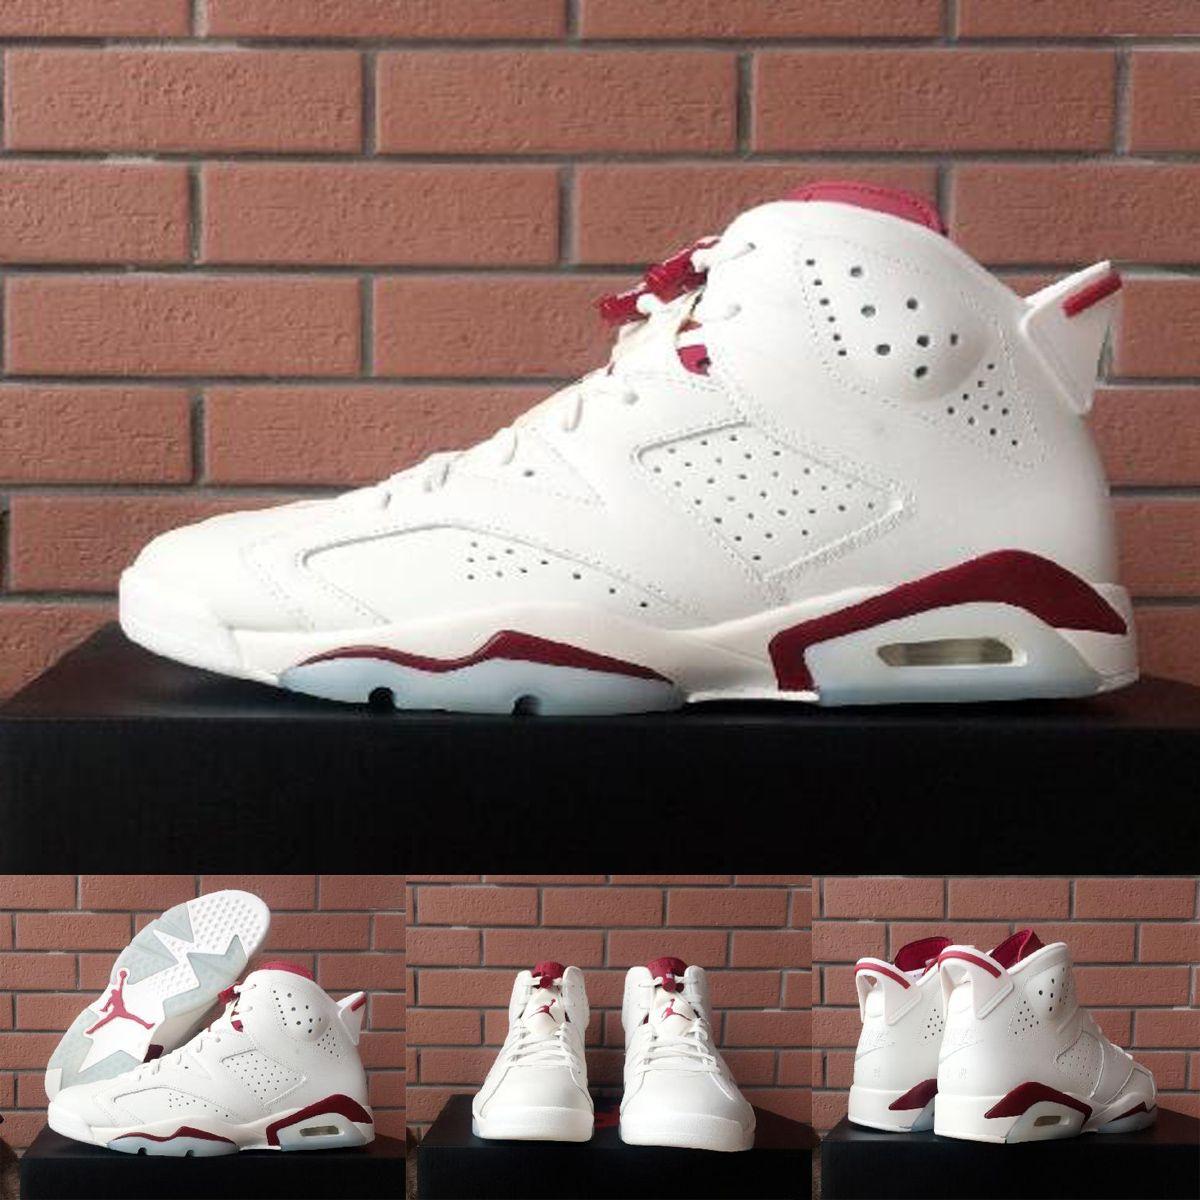 new products a8666 814fd Nike Air Jordan 6 Vi Retro Maroon Off White Infrared Mens Womens Basketball  Shoes,100% Original Quality Jordan6 Aj6 For Men Women Sneakers Shoes Men ...